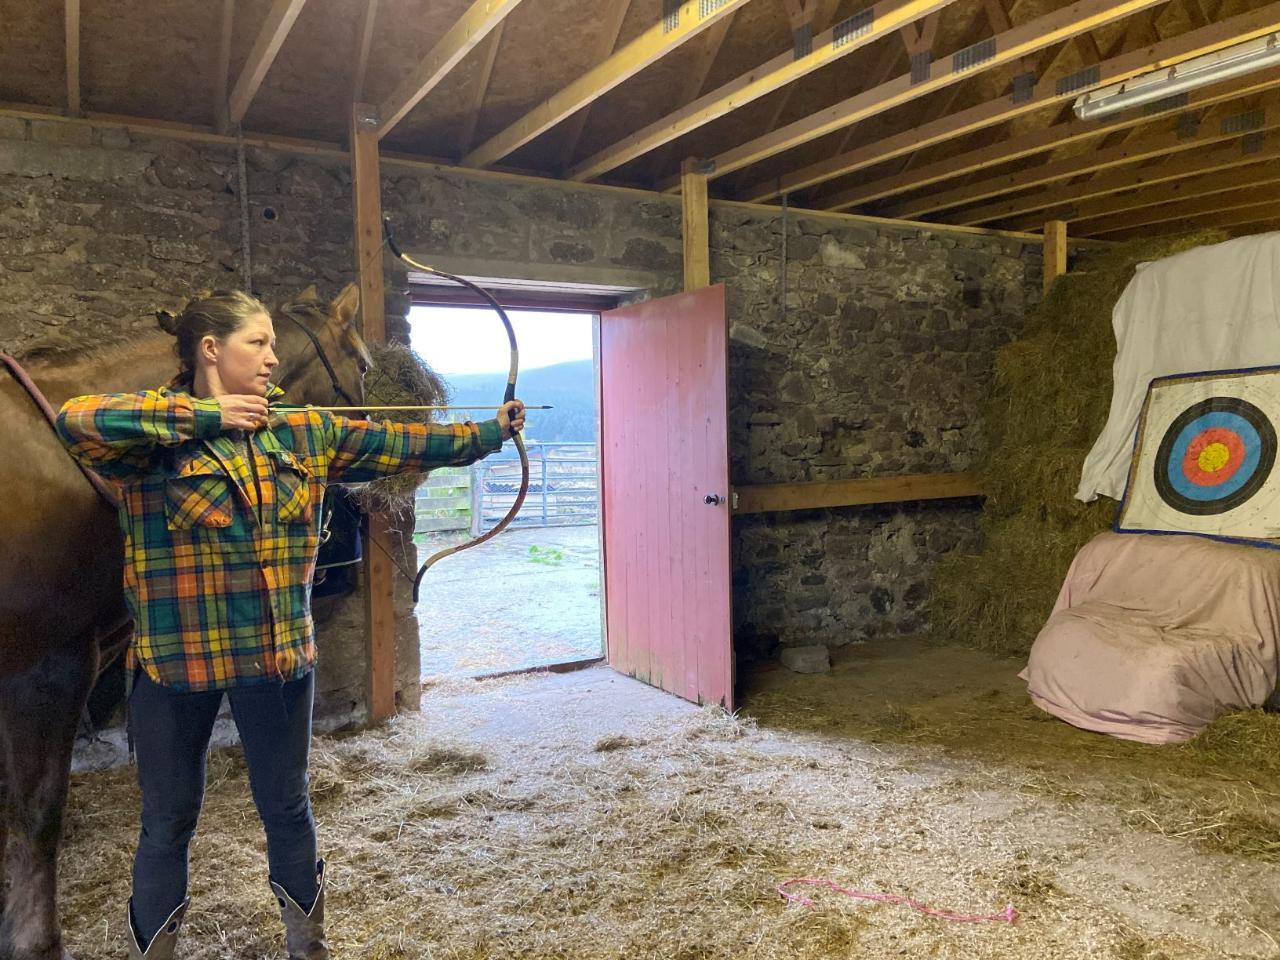 2021 - Kintyre - DAY - Horseback Archery